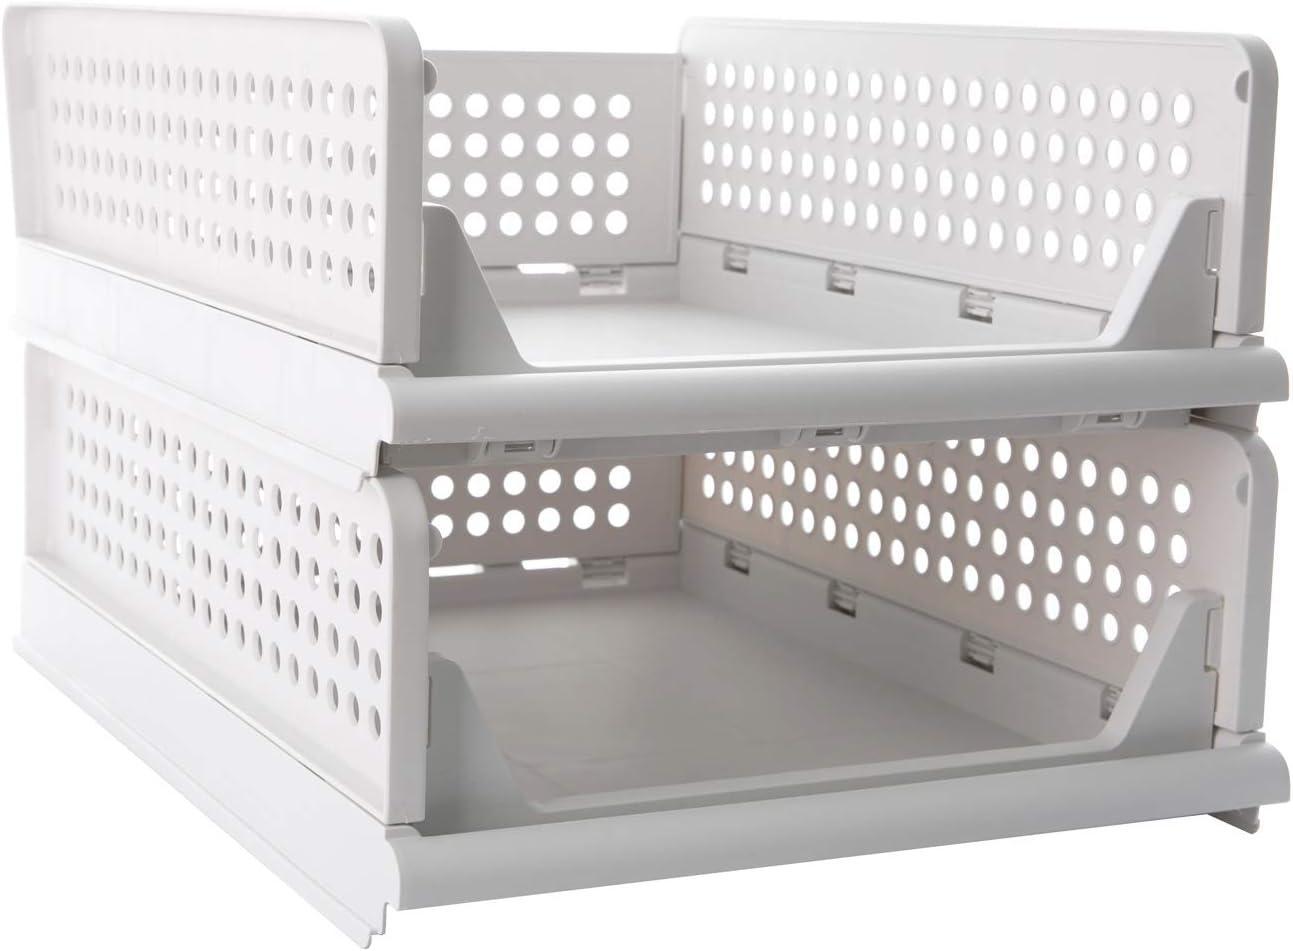 Pinkpum Stackable Plastic Storage Basket-Foldable Closet Organizers Storage Bins 2 Pack-Drawer Shelf Storage Container for Wardrobe Cupboard Kitchen Bathroom Office (2S)